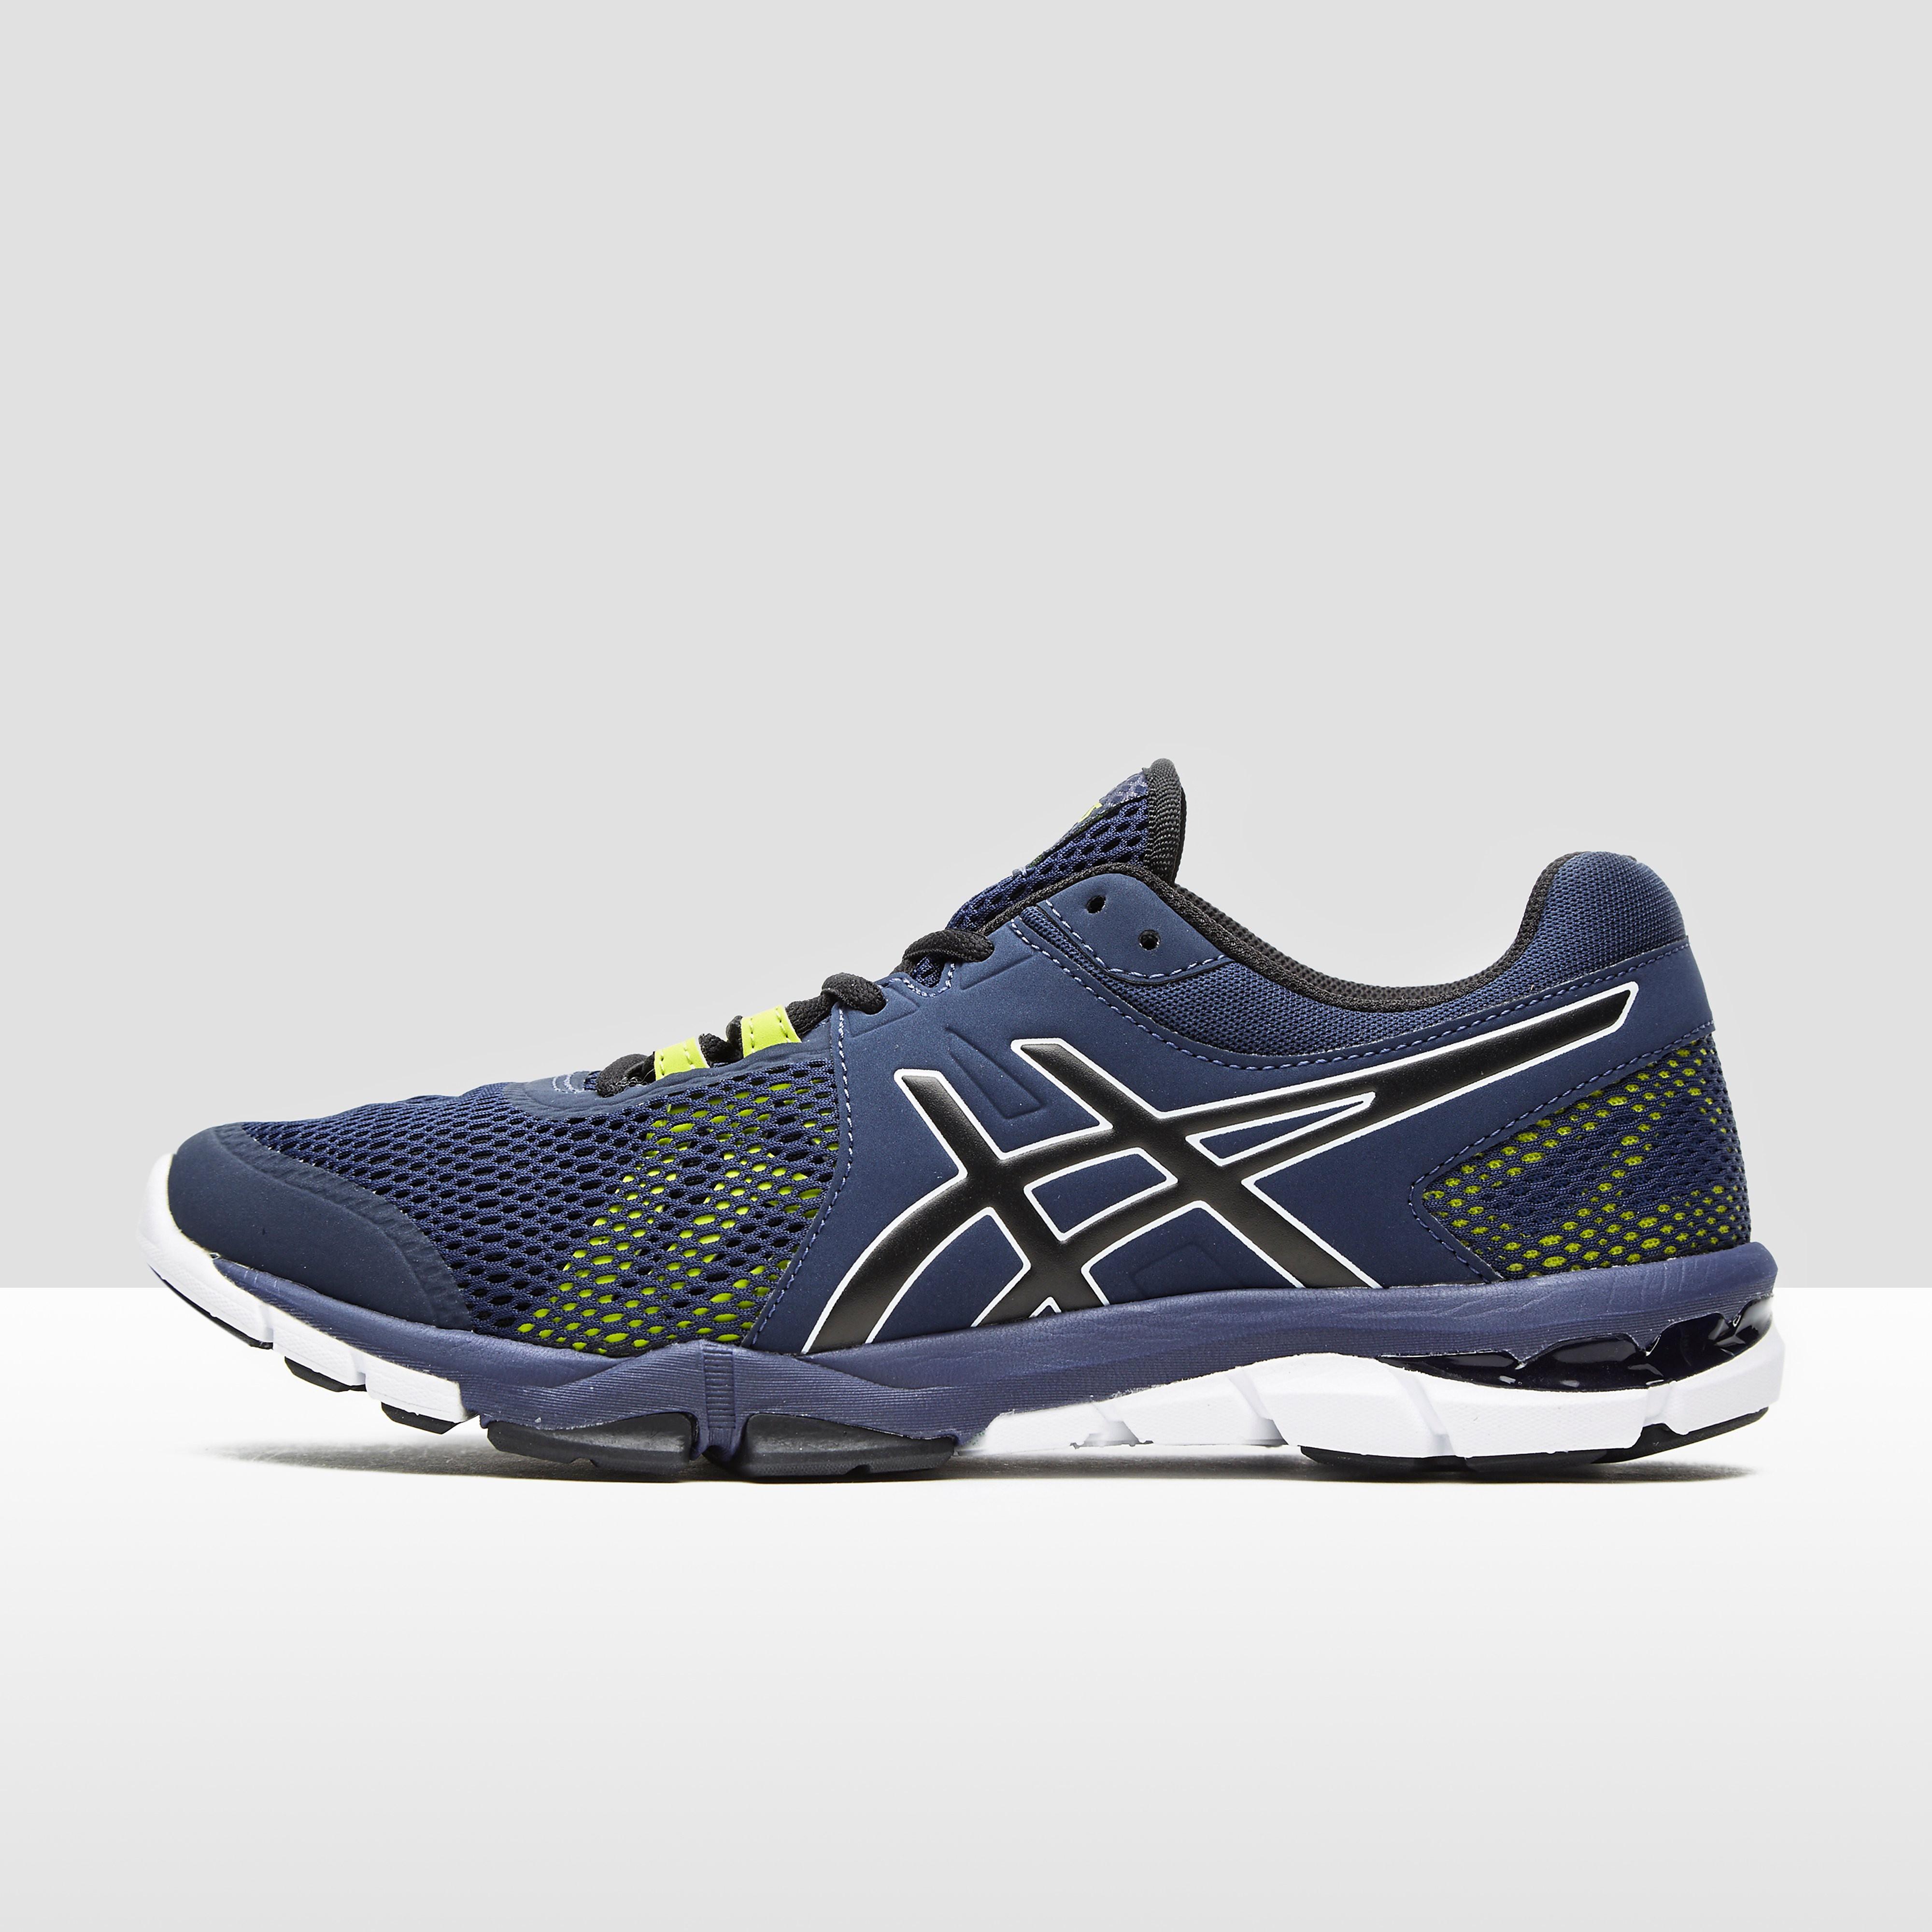 ASICS GEL-Craze TR4 Men's Training Shoes